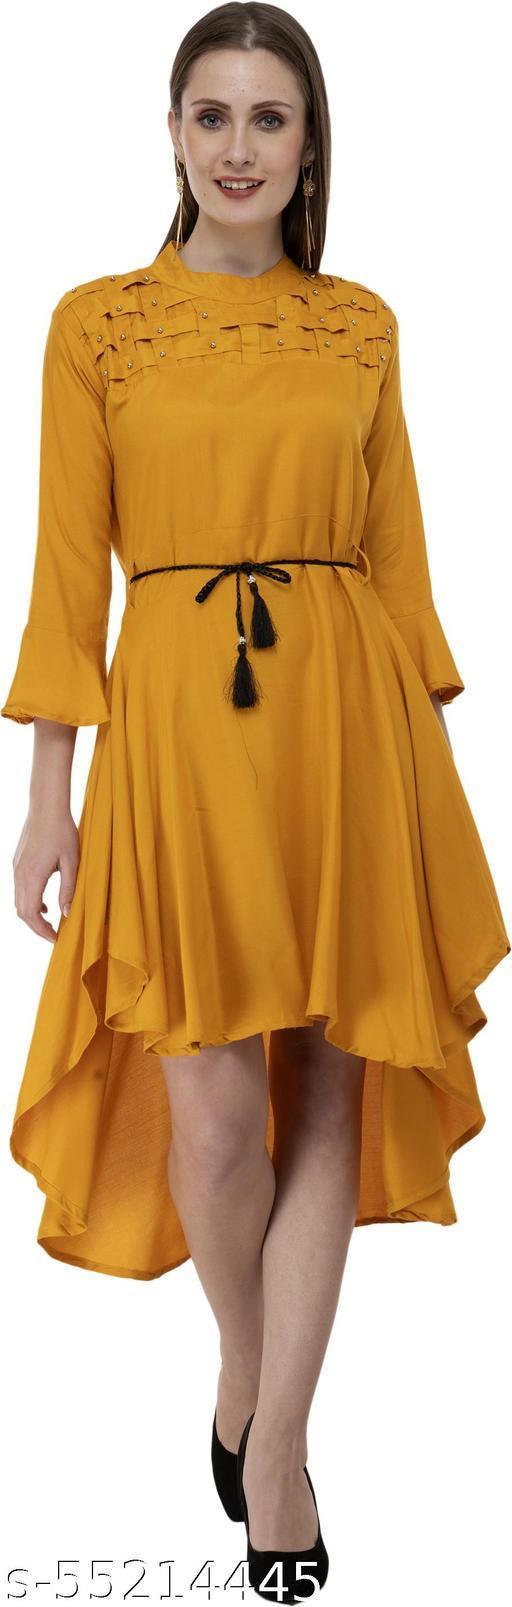 Mixcult Women High Low Yellow Dress